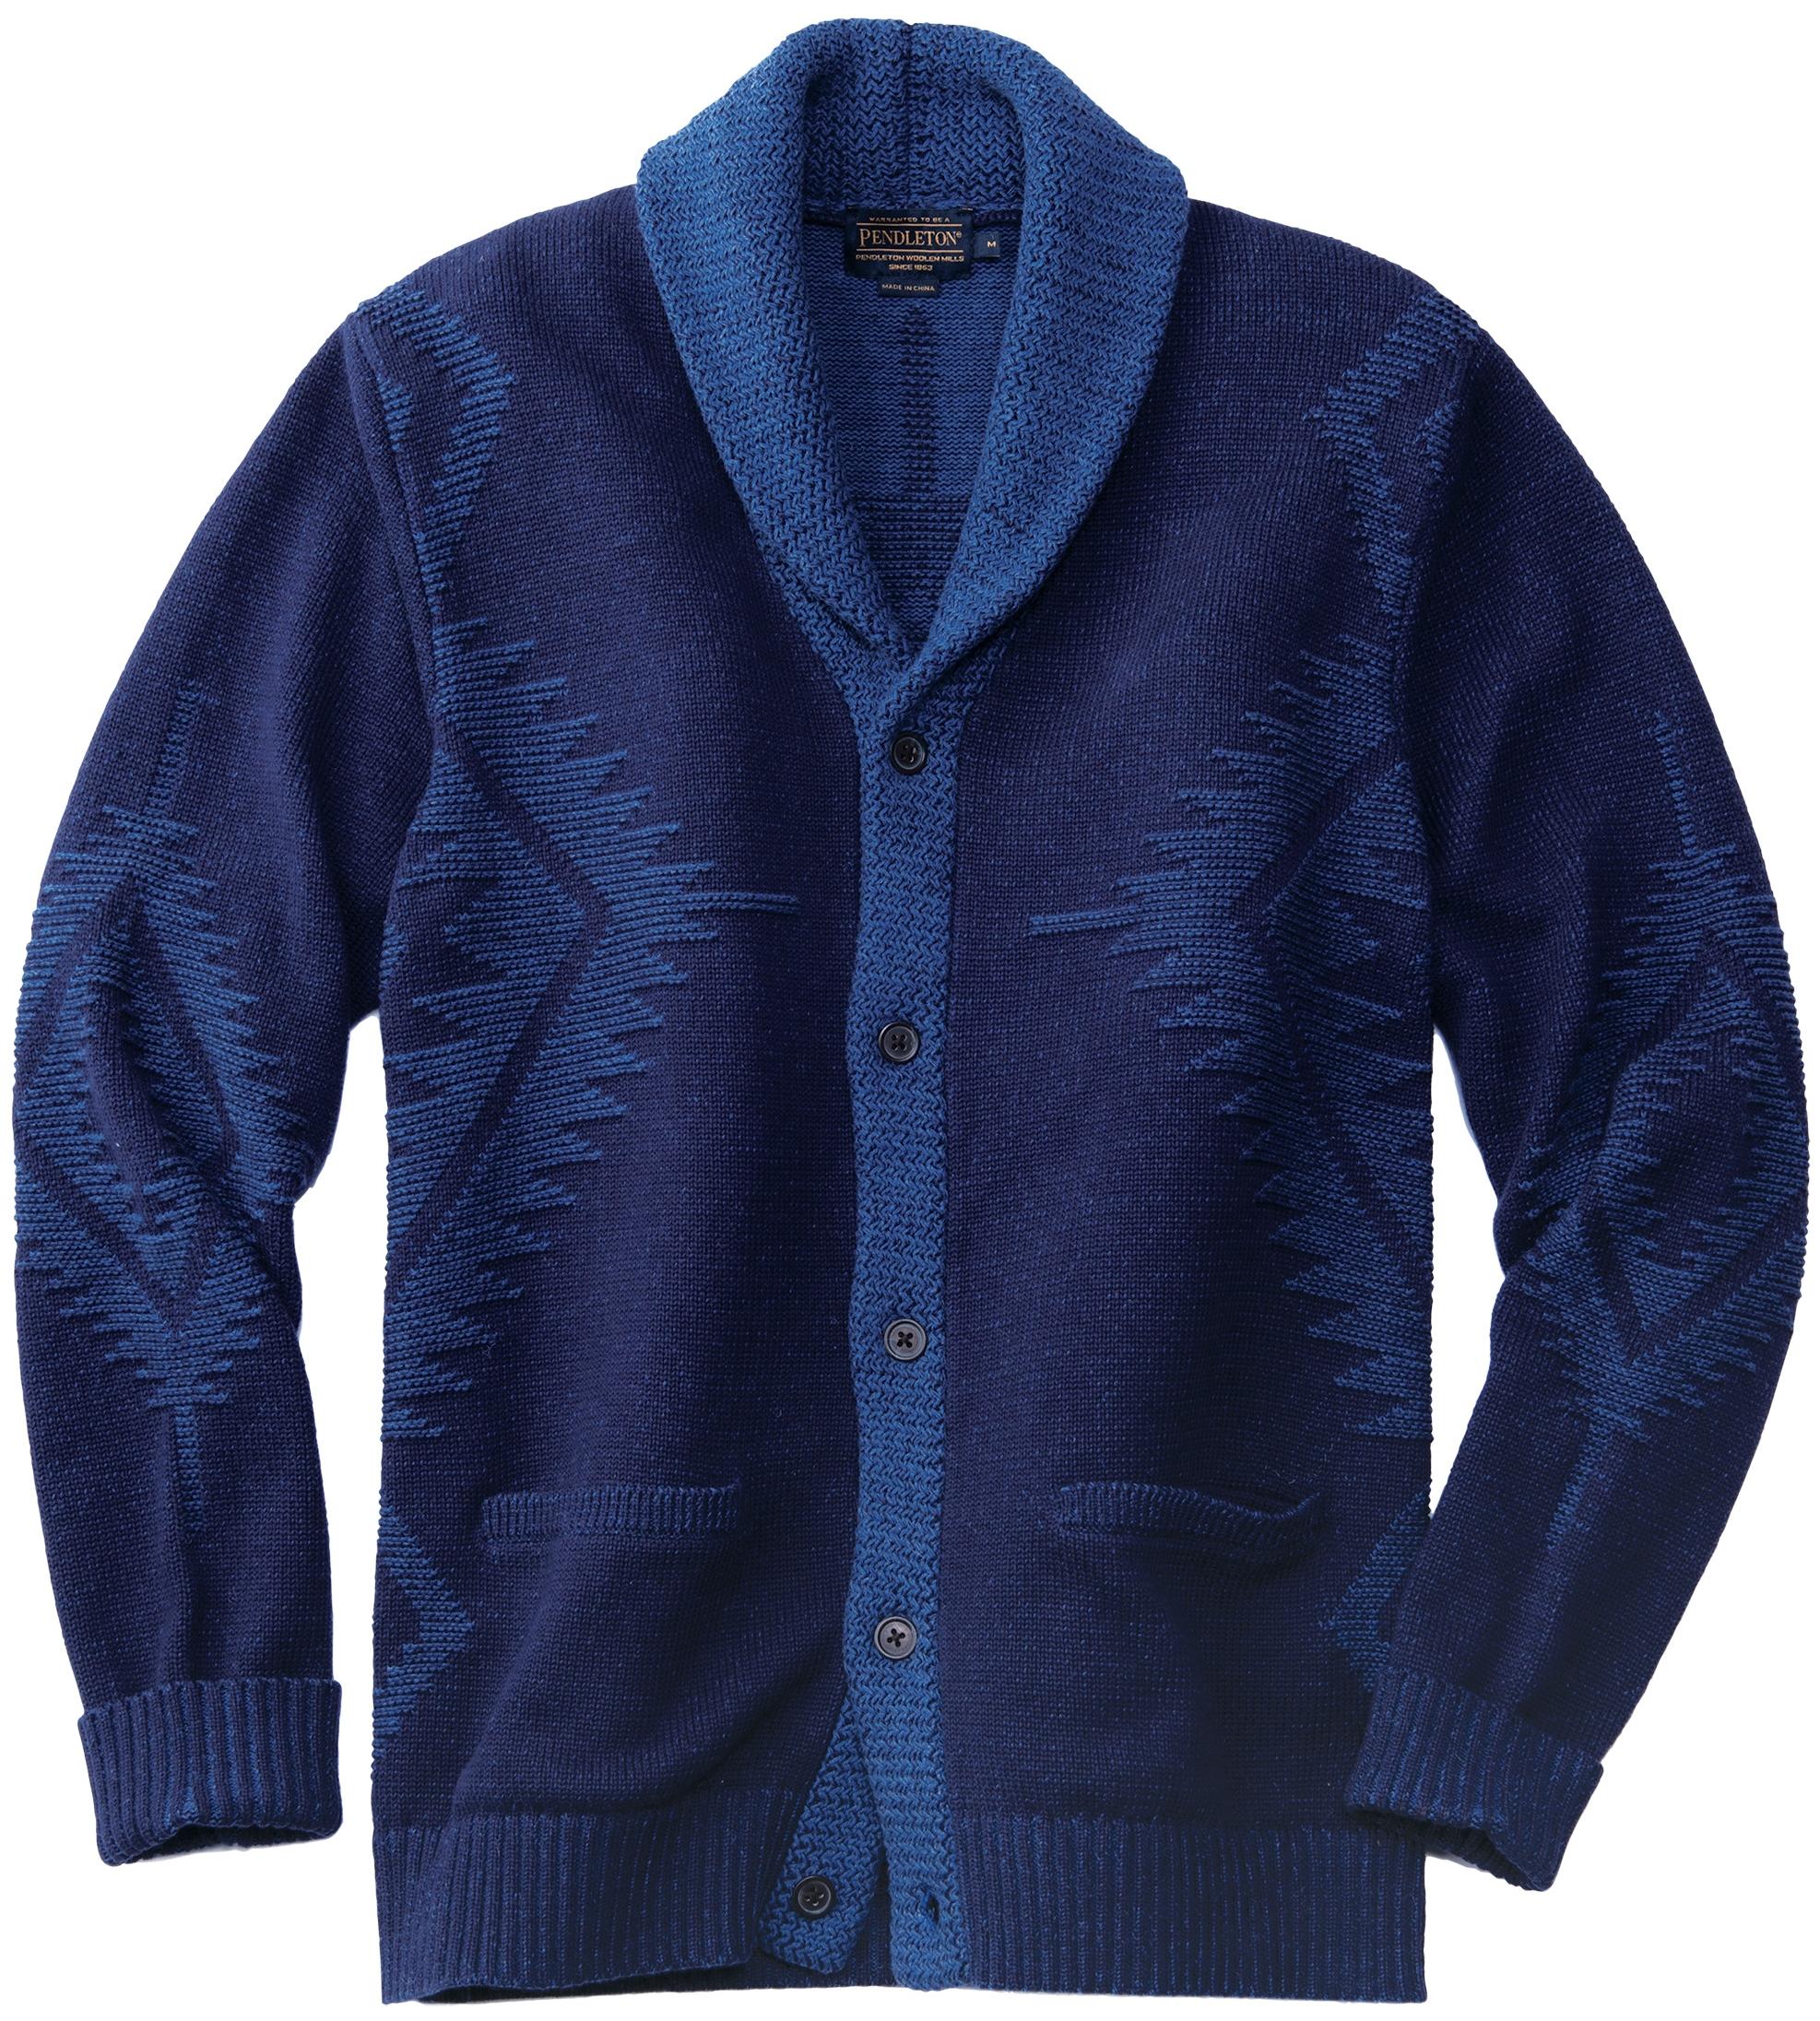 Pendleton Willamette Pass Cardigan, $159